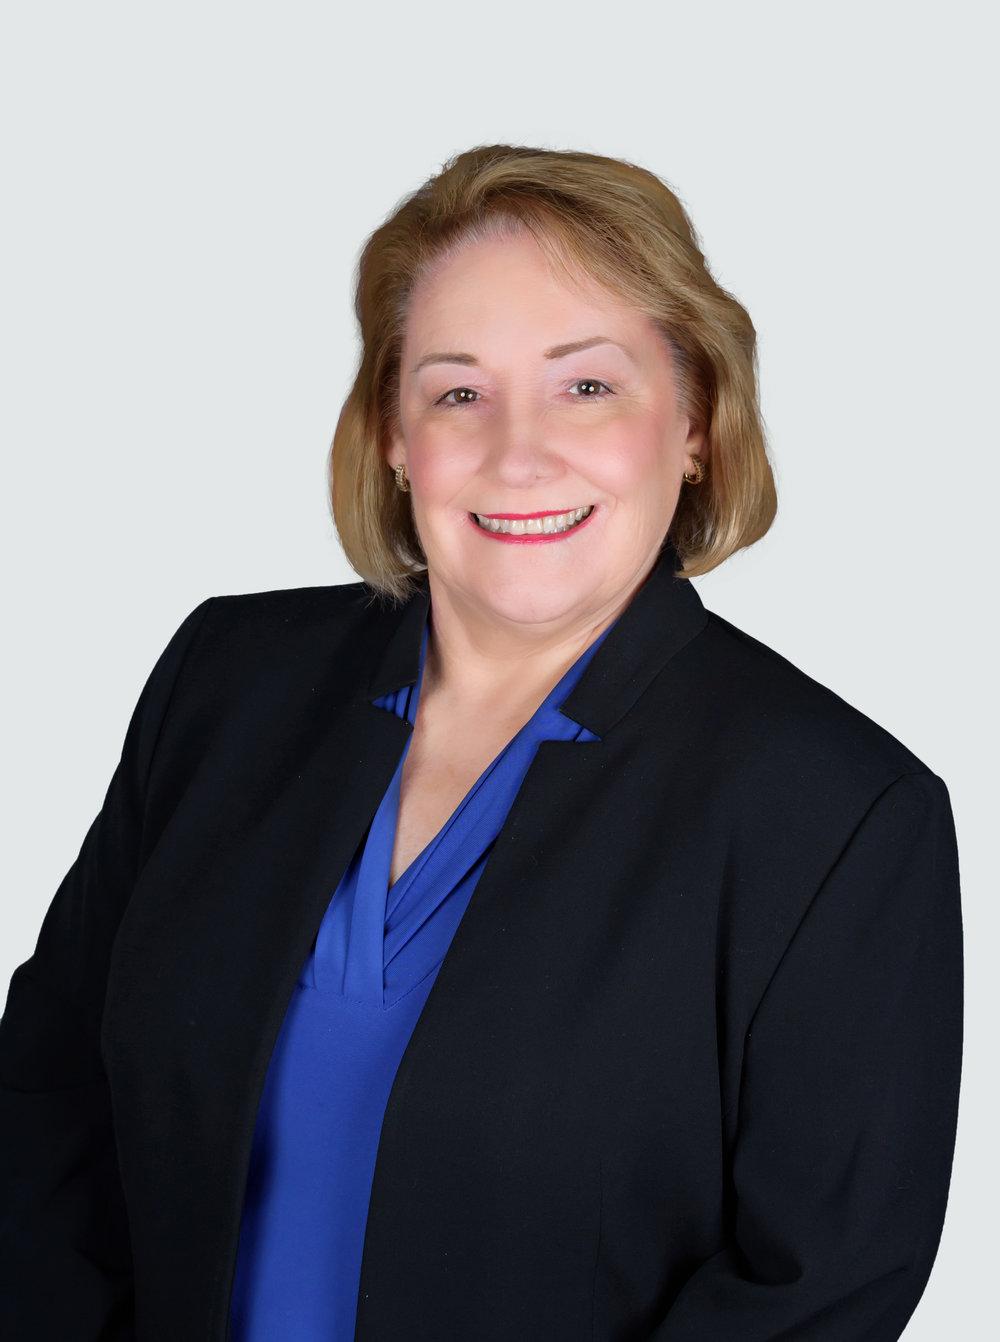 Terri Stanganelli, Sr. Director of Risk Mgmt/Telecommunications